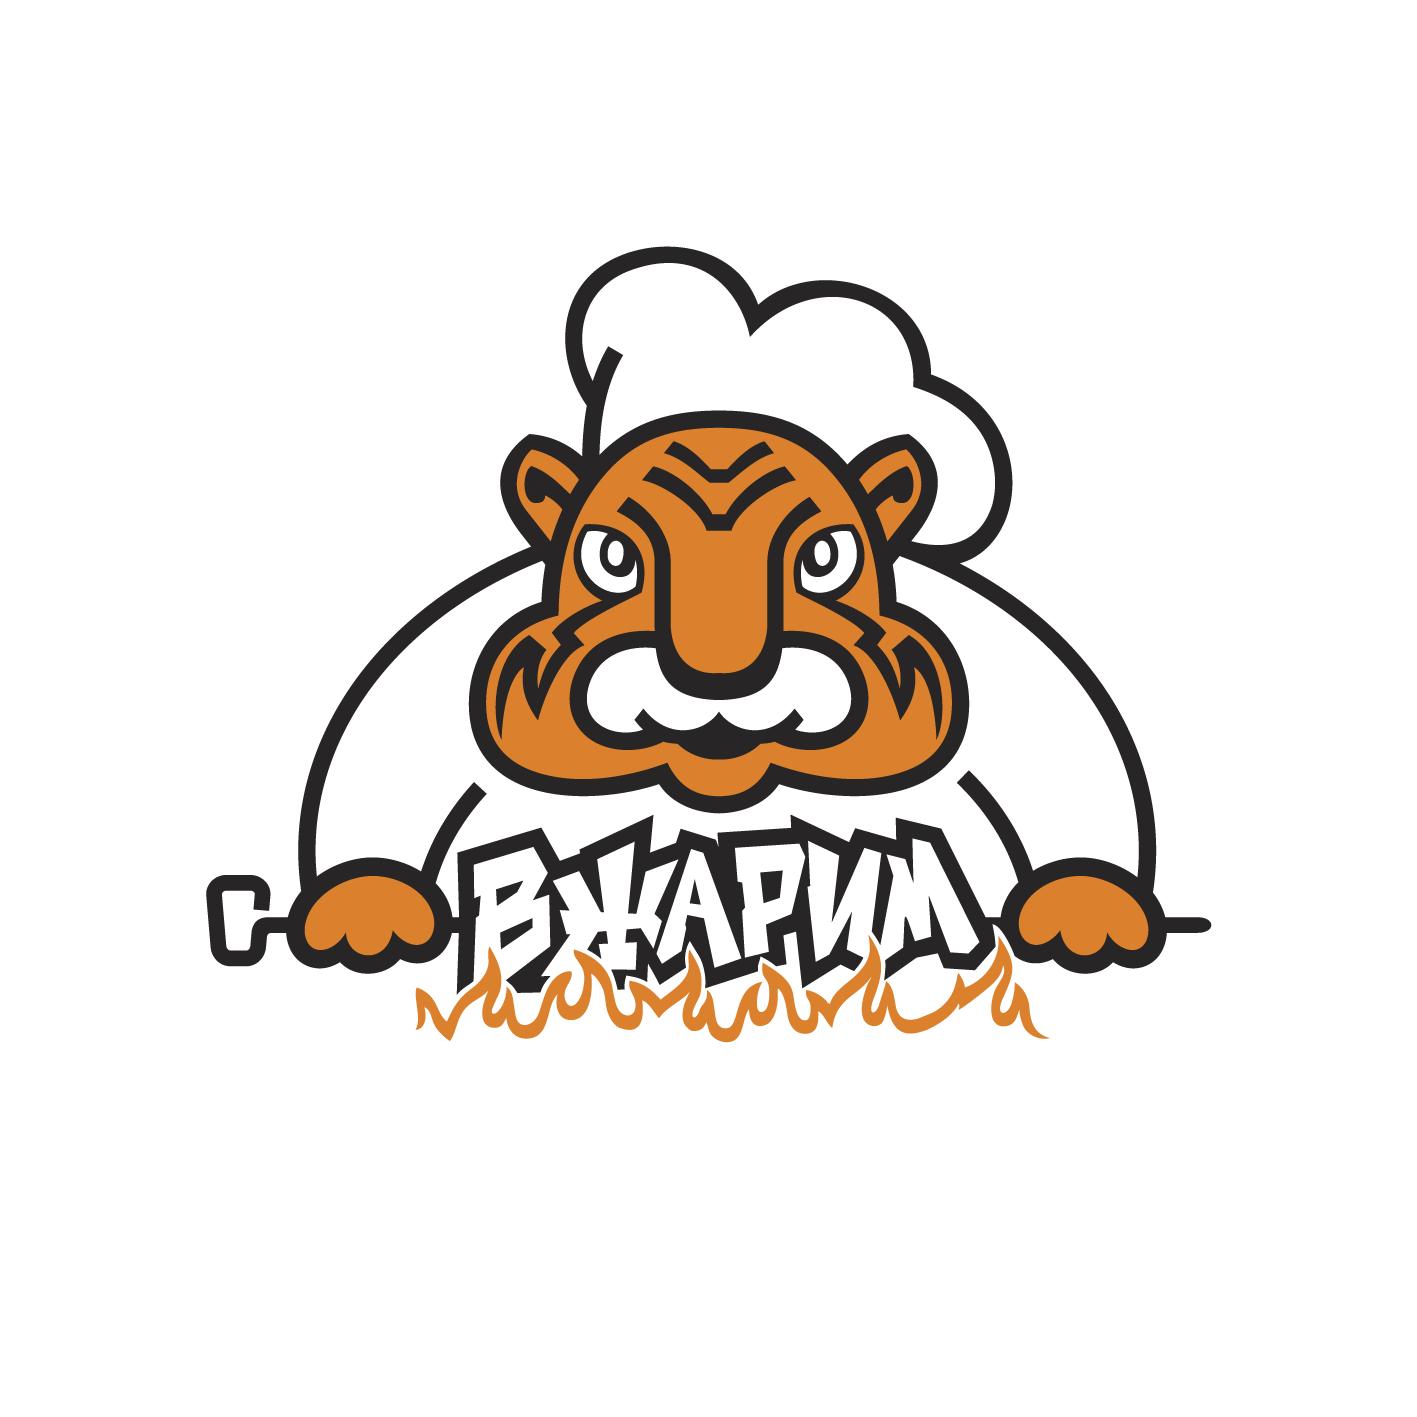 Требуется, разработка логотипа для крафт-кафе «ВЖАРИМ». фото f_0926009d96145646.png